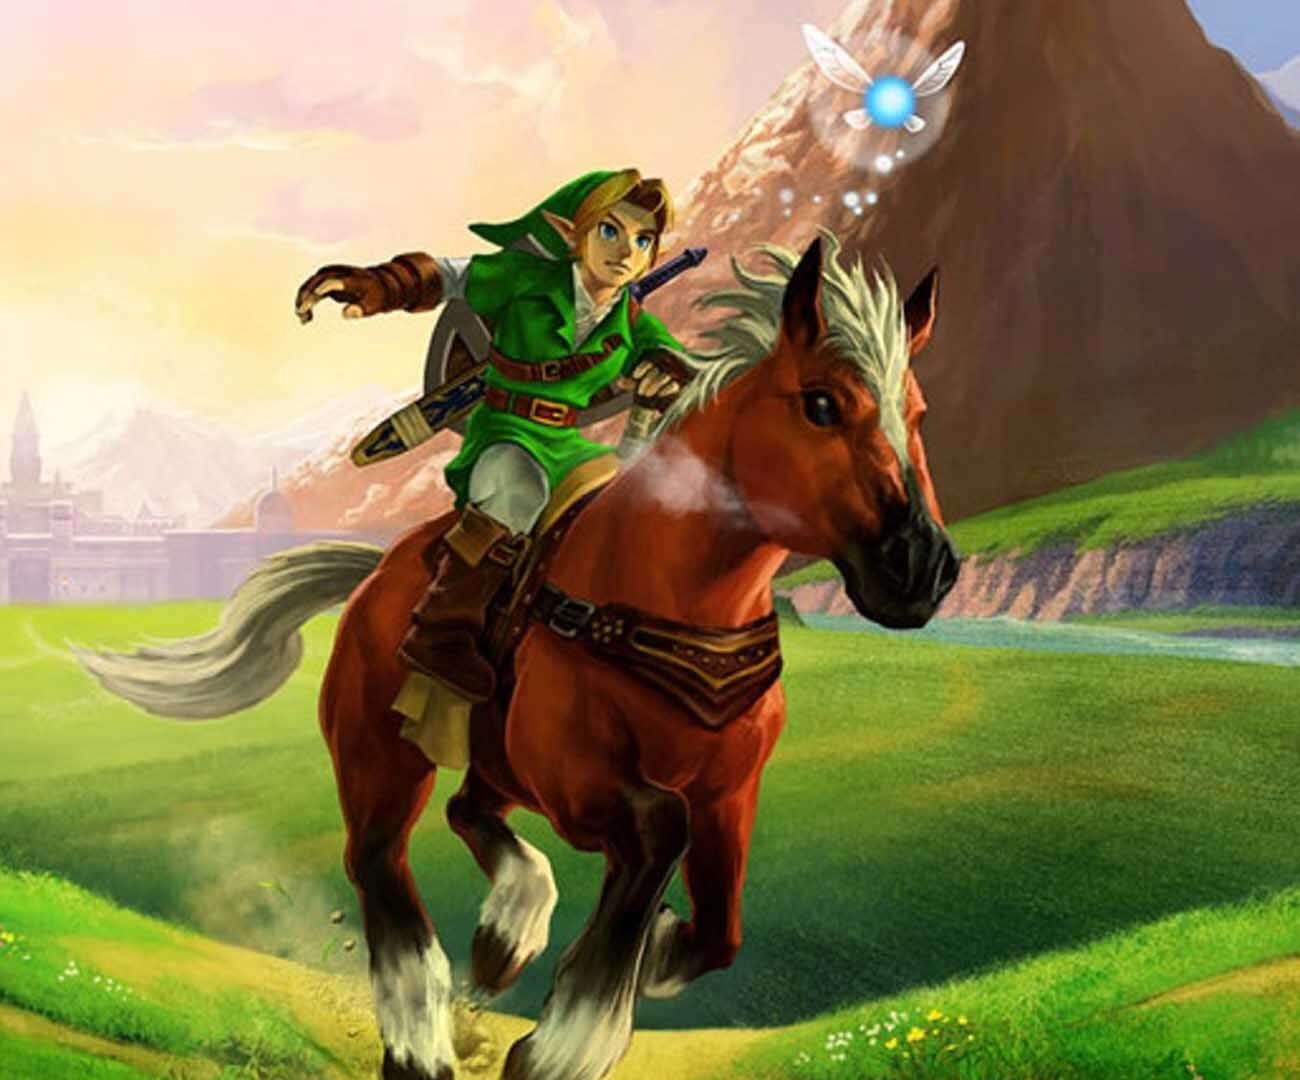 Remaster Legend Of Zelda Ocarina Of Time za trudny dla N? Fani zrobili to sami